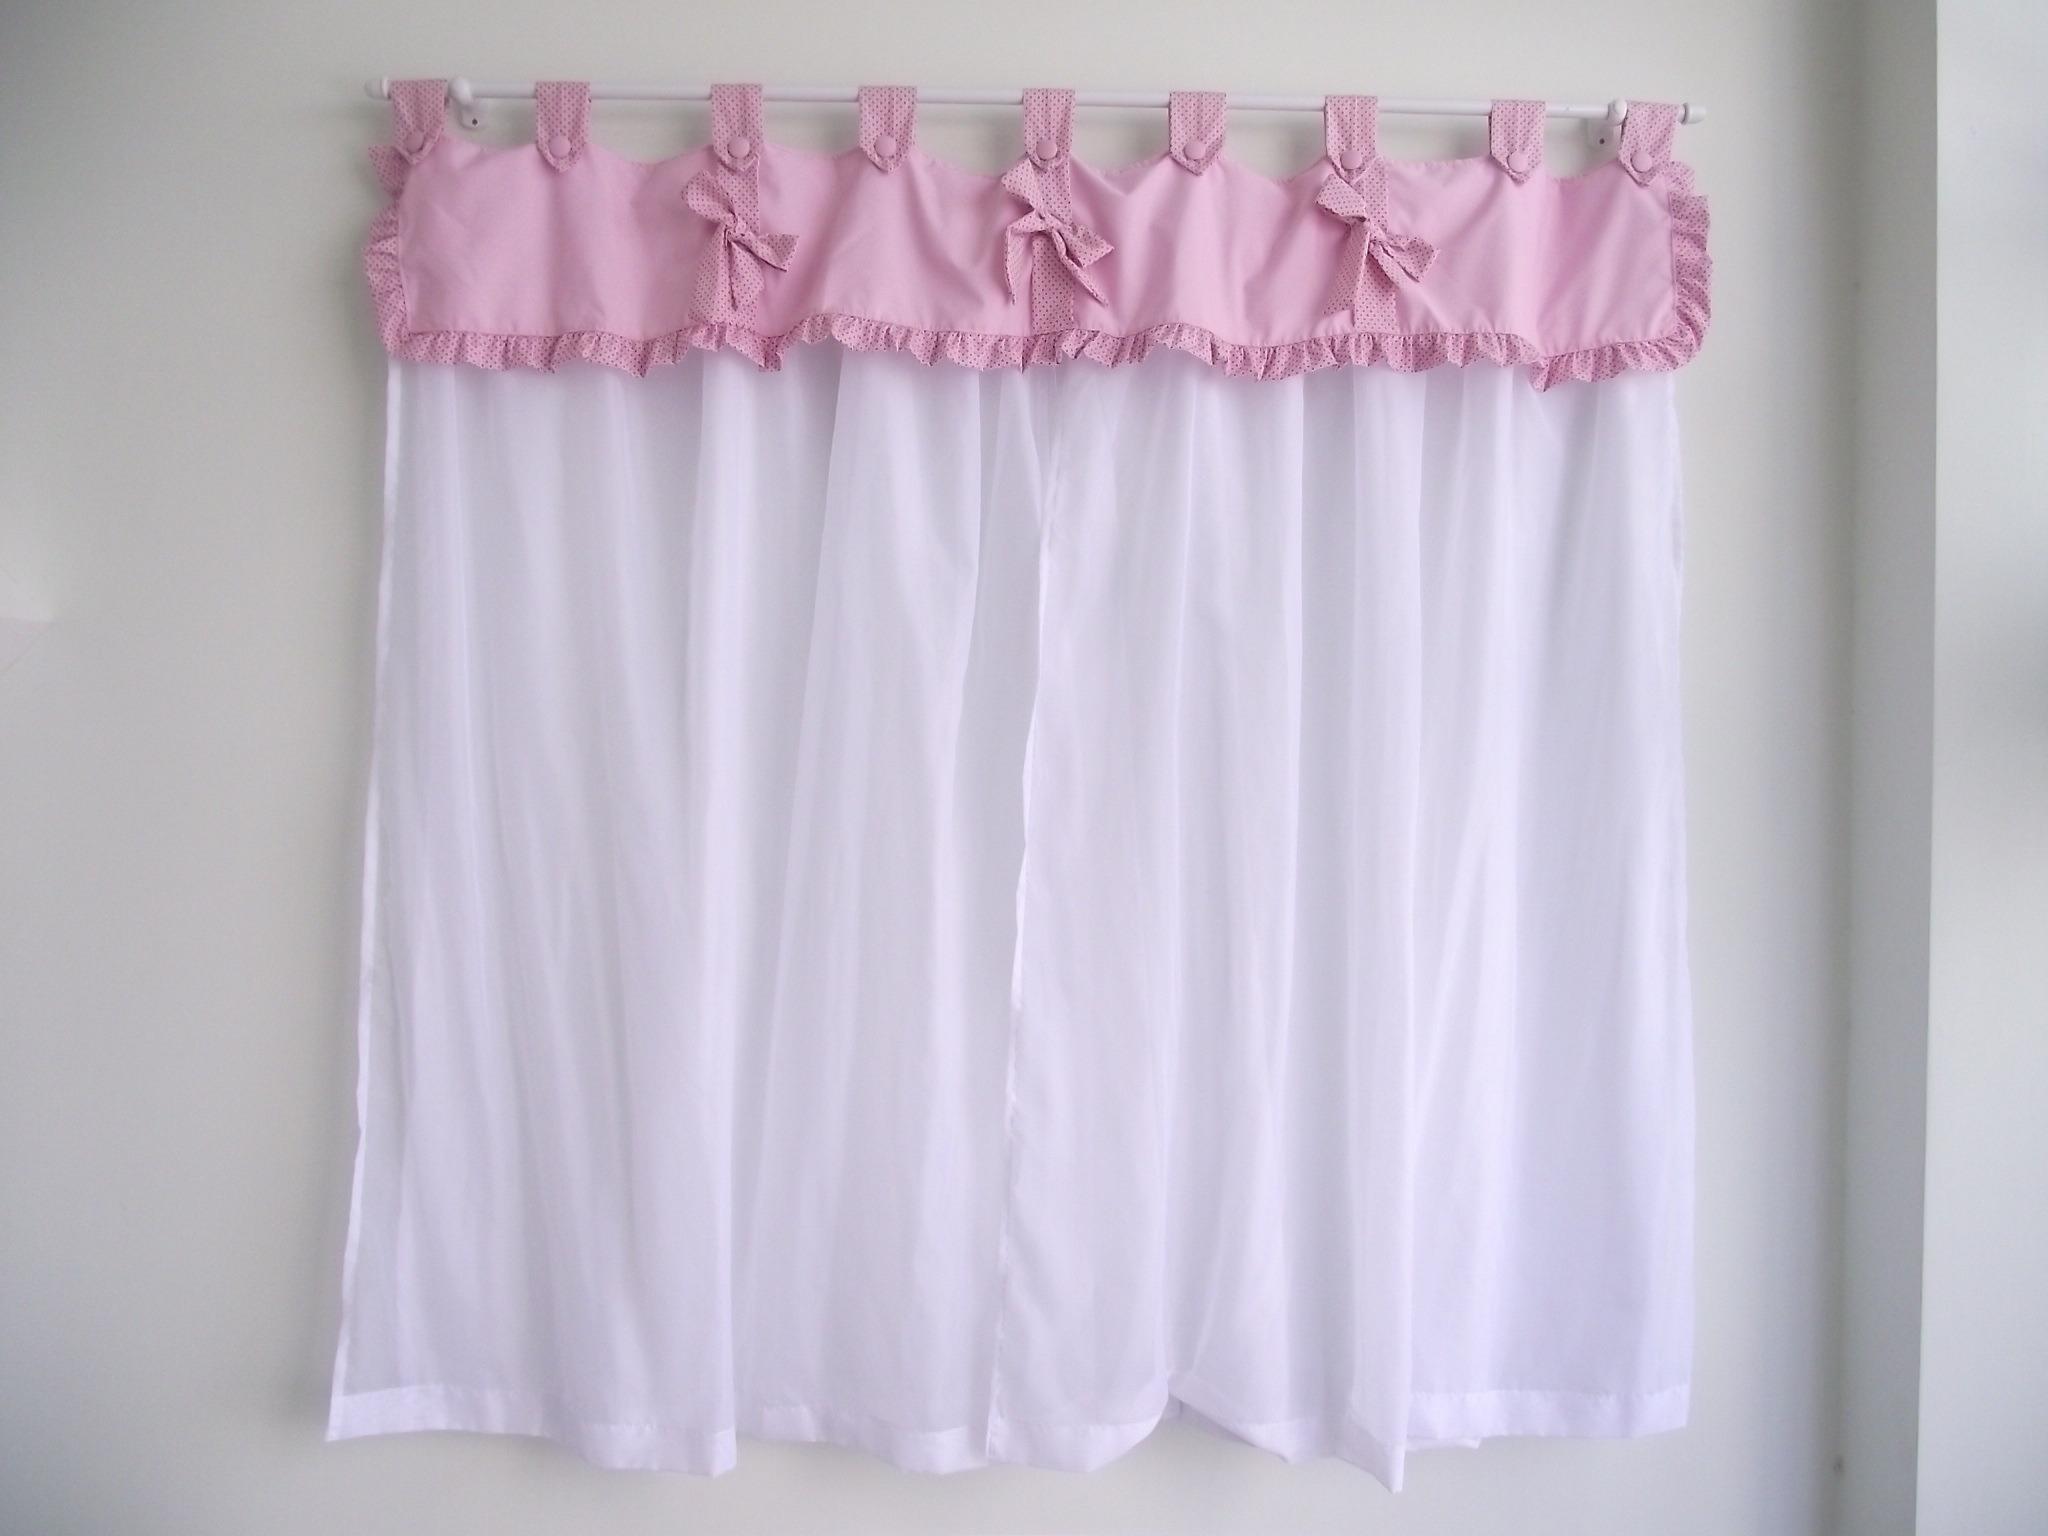 Cortina para quarto de beb la o de fita sonho de beb enxovais elo7 - Modelos de cortinas infantiles ...